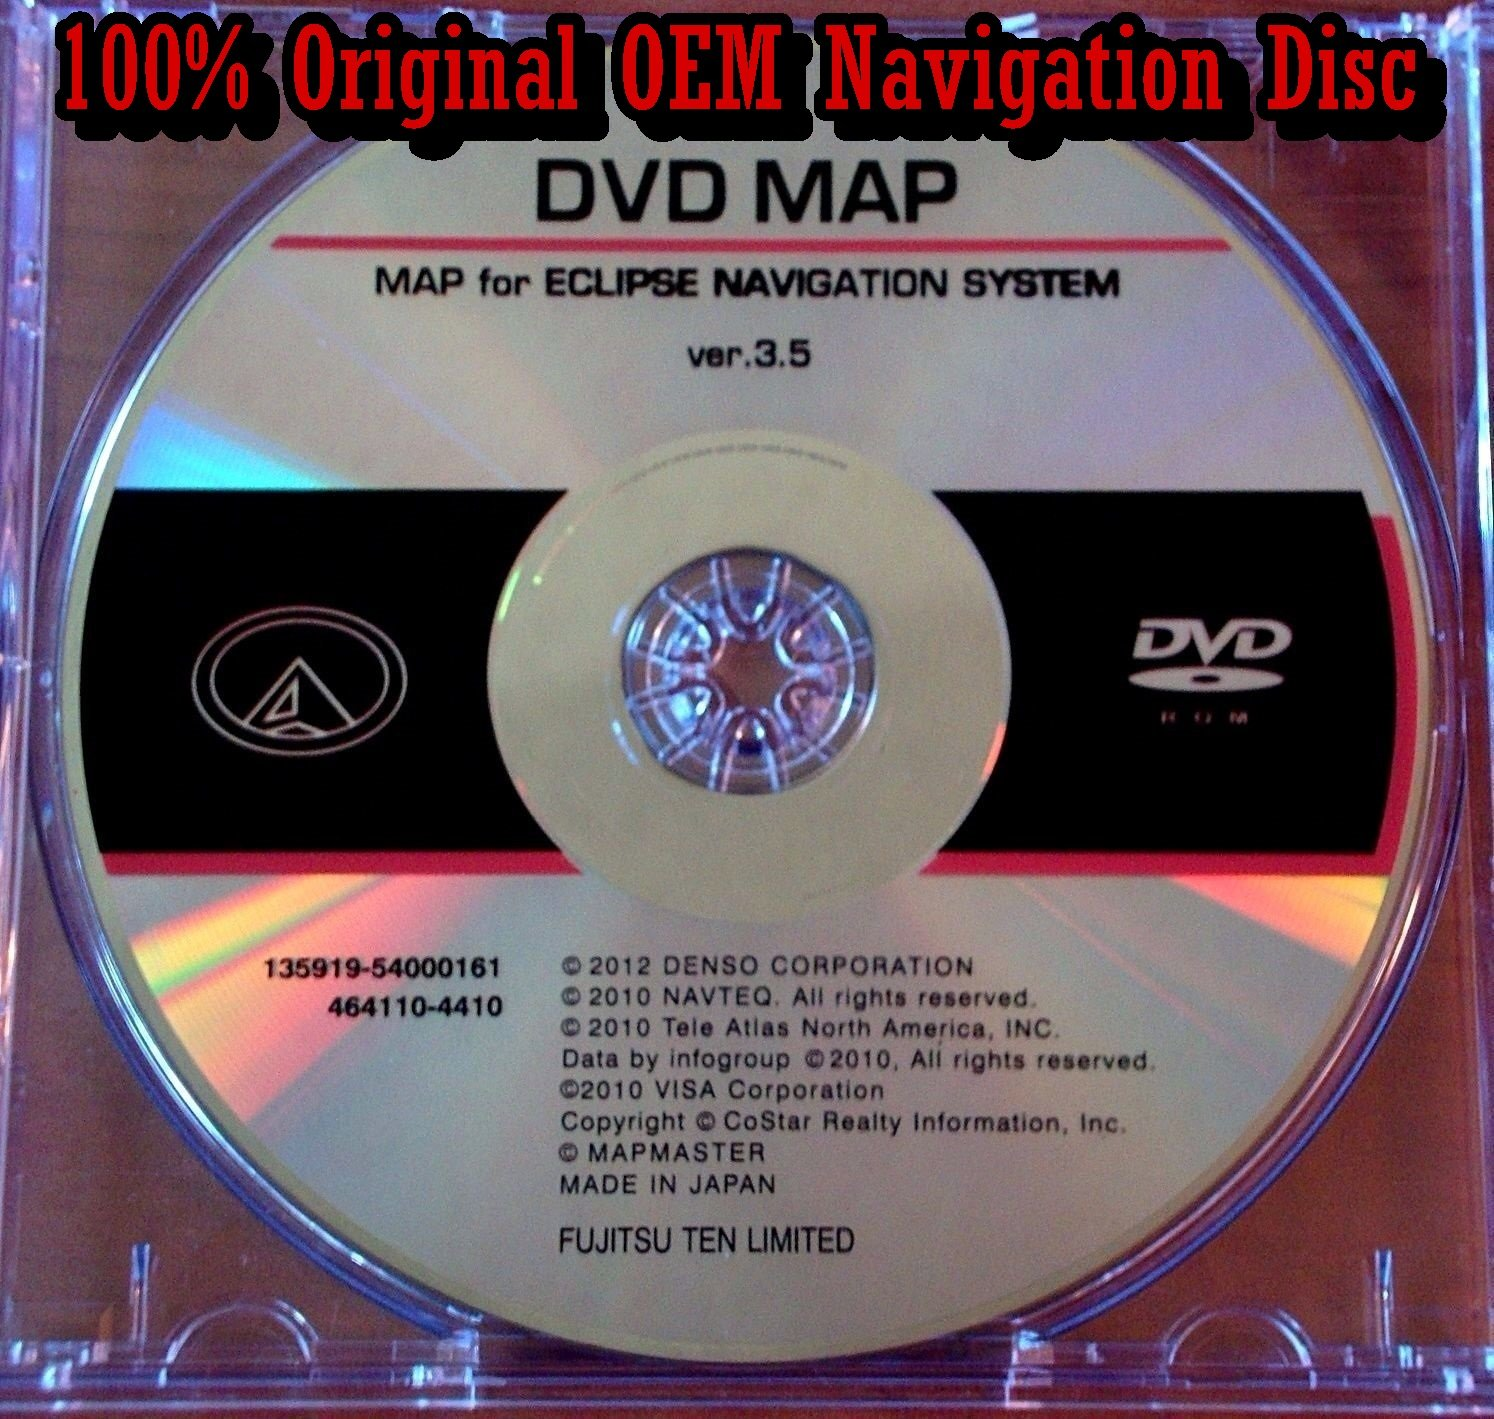 Buy MDV-82D Eclipse Navigation Map Update DVD version 3 5